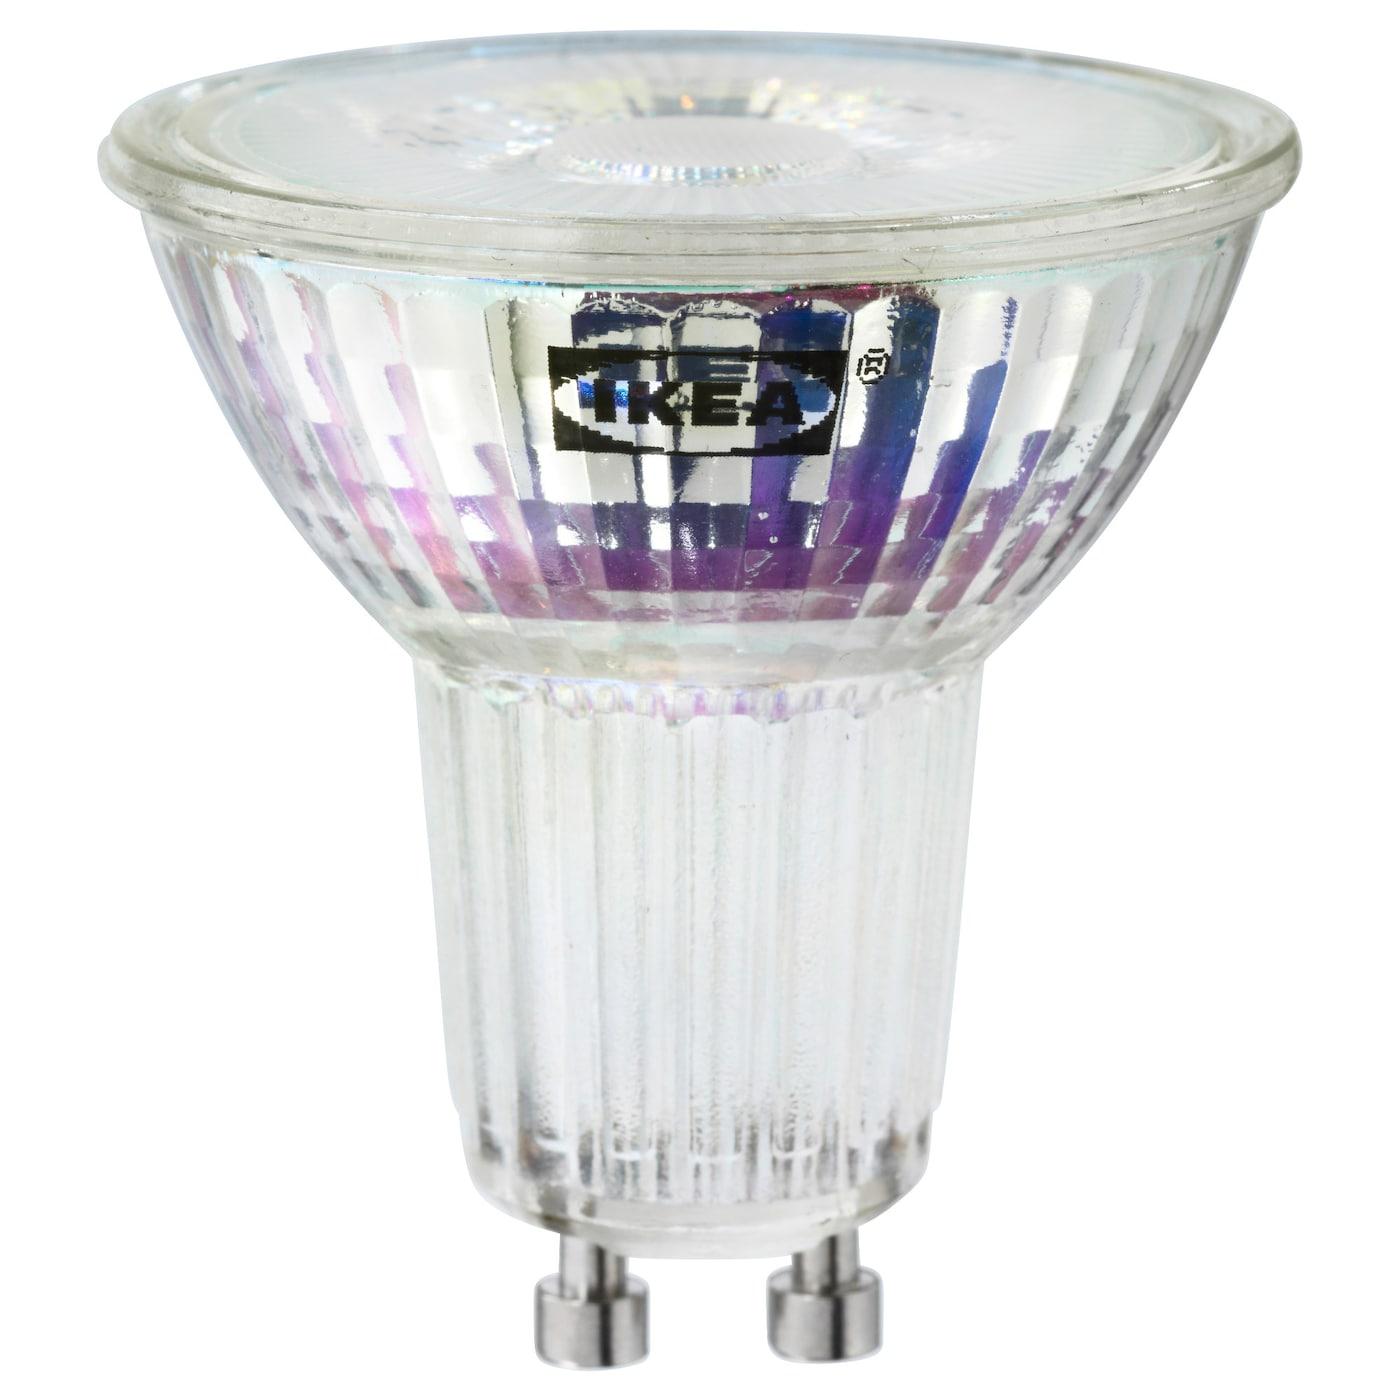 lunnom-led-bulb-gu10-400-lumen__0502969_pe632374_s5 Wunderschöne Test Led Lampen Gu10 Dekorationen